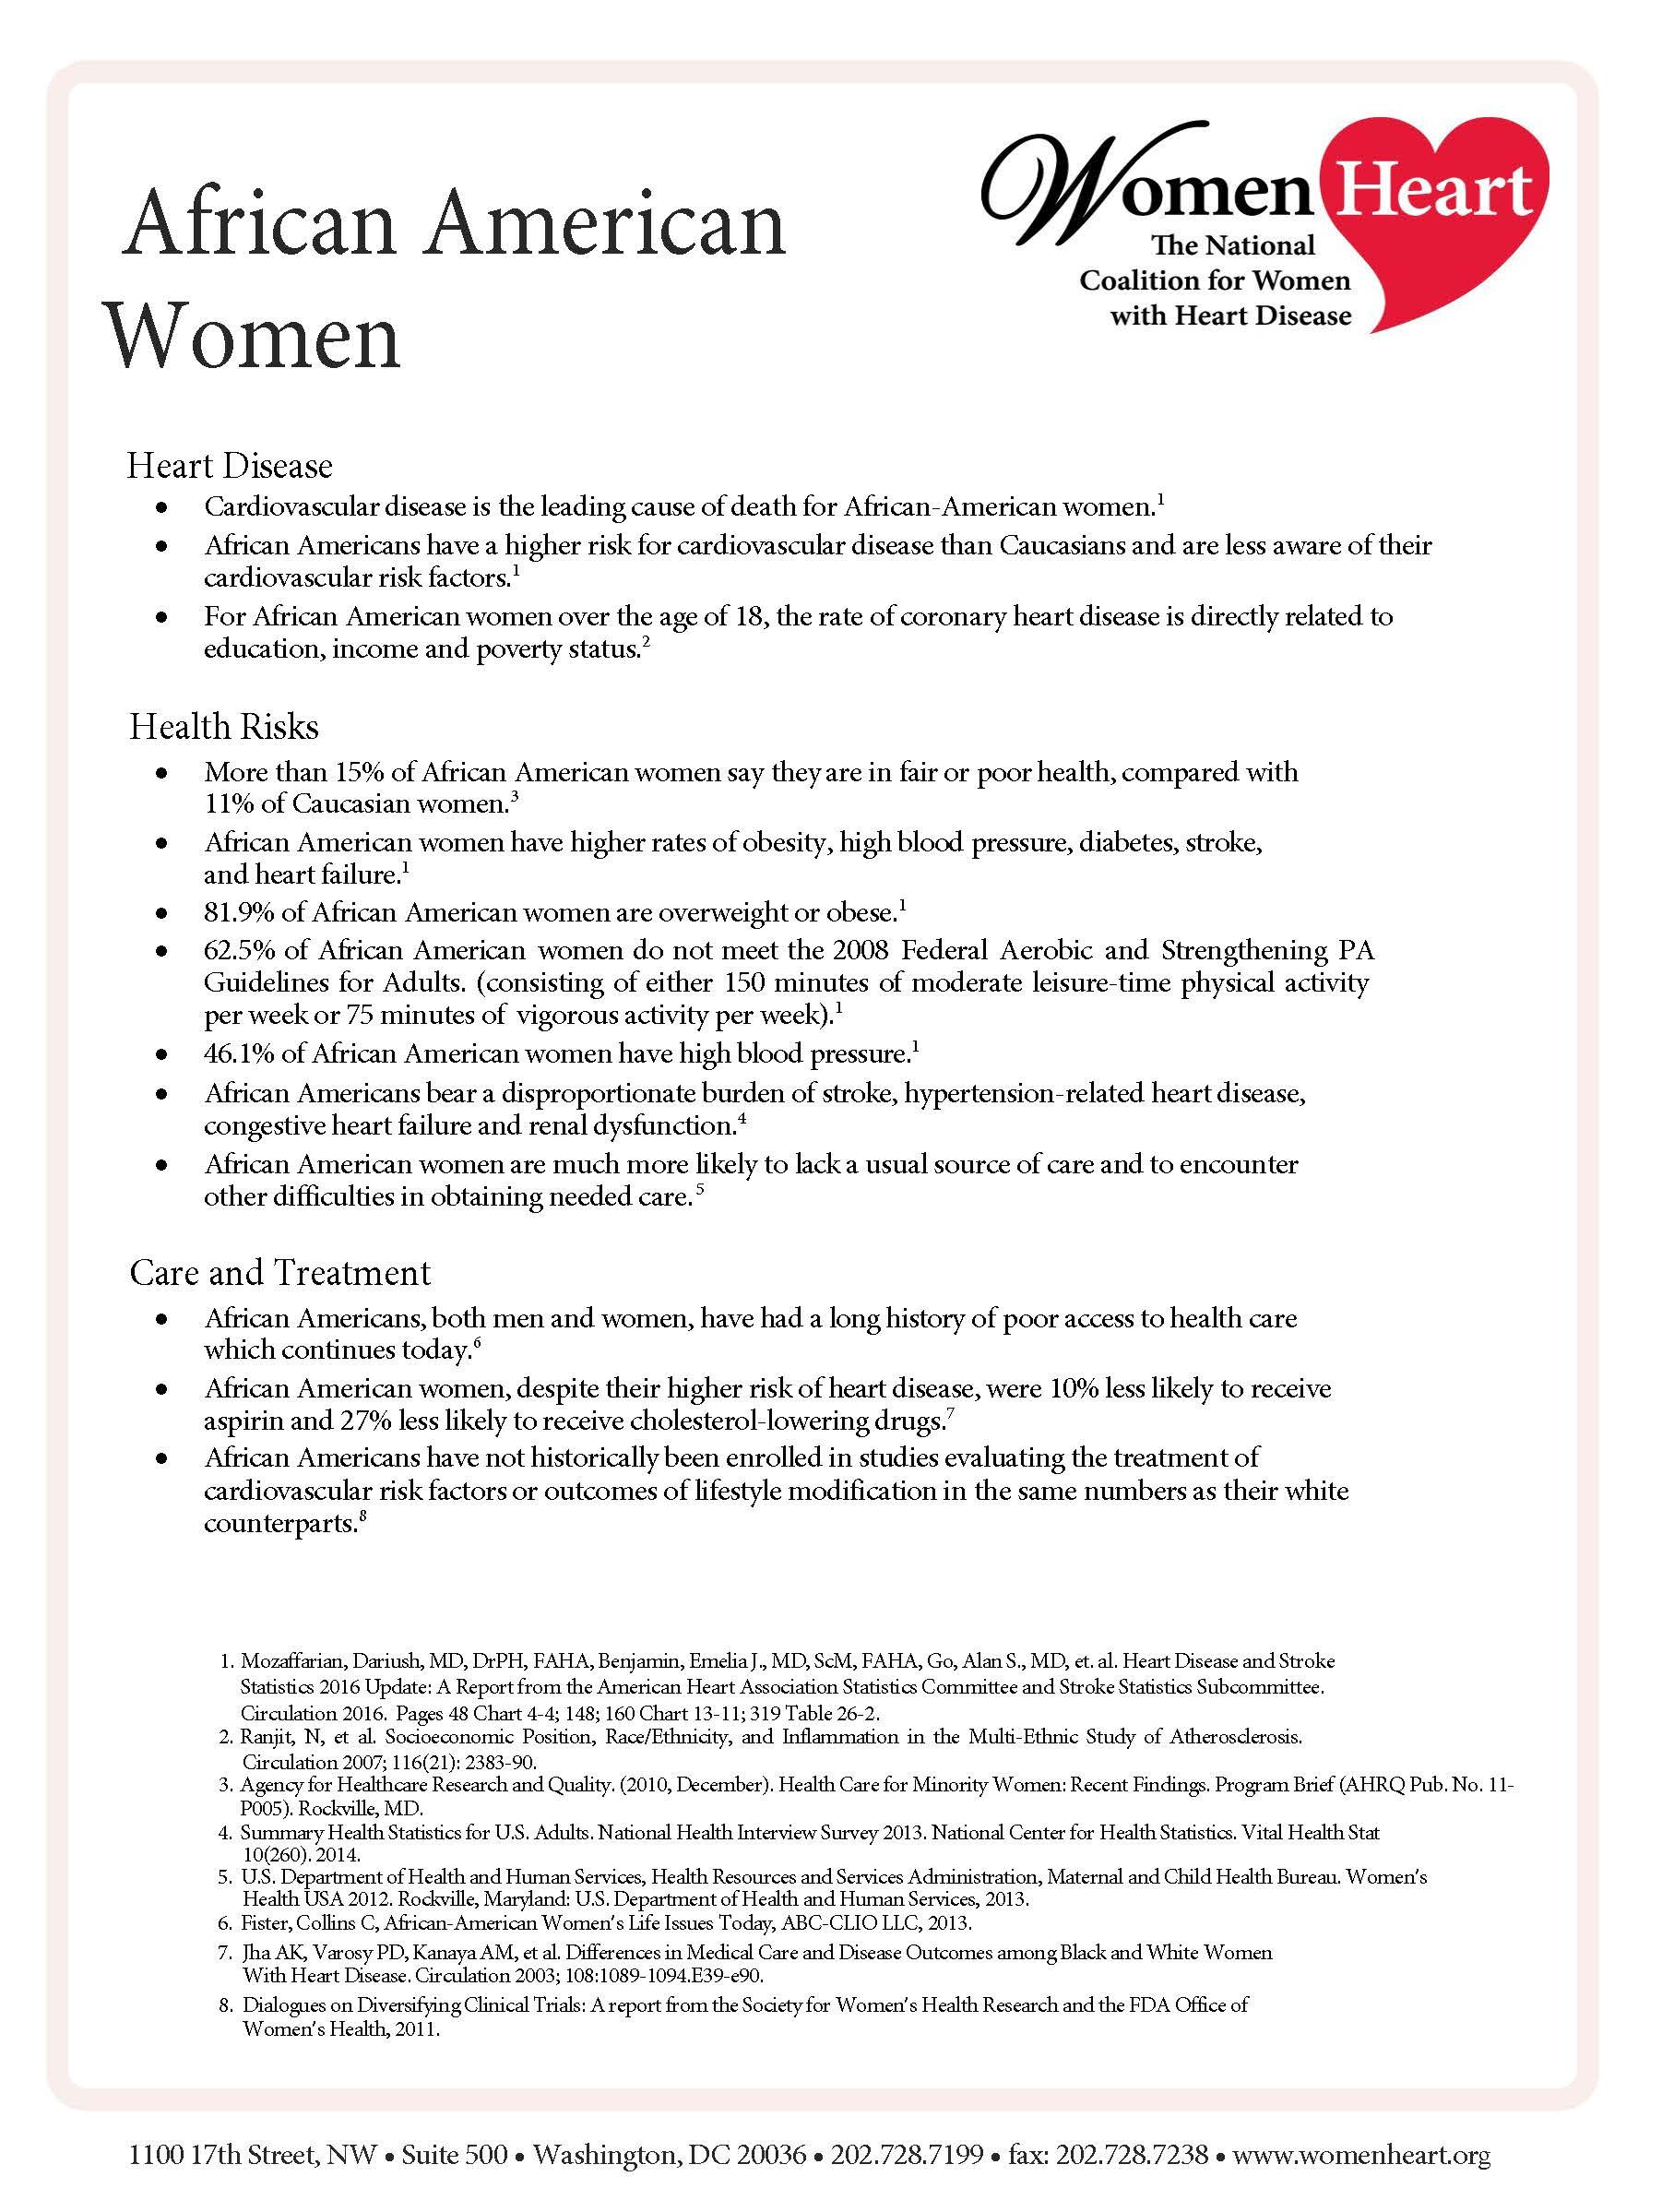 8. African American Women & HD FactSheet